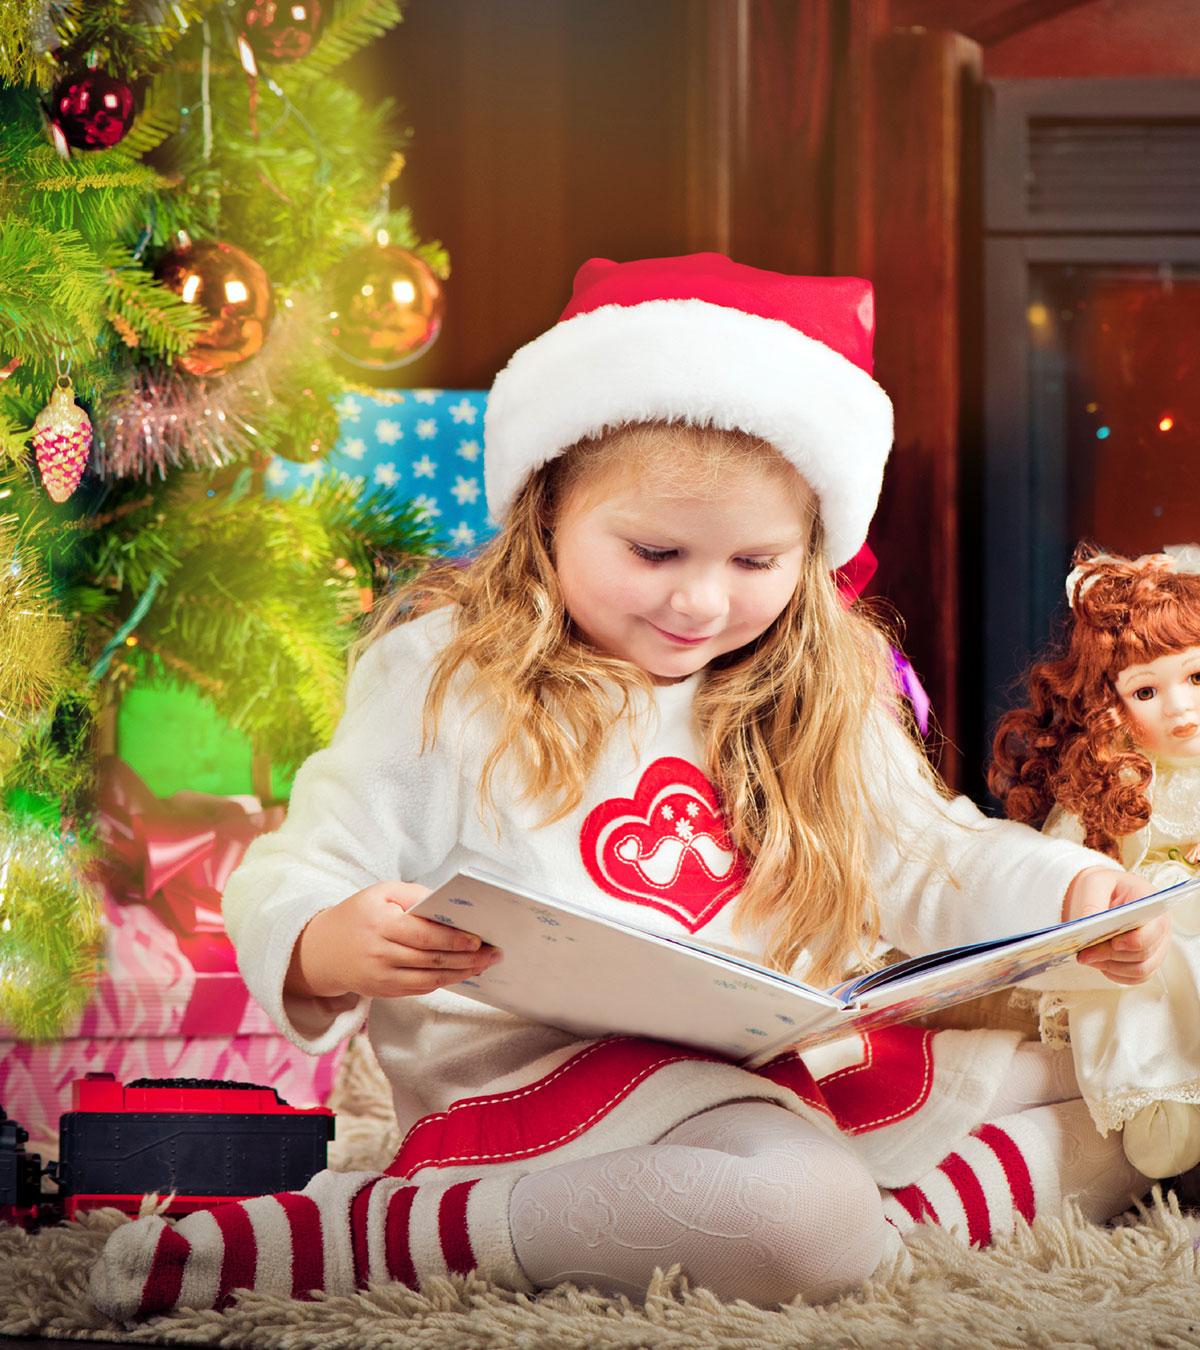 Christmas Story For Kids.The Christmas Story For Kids Birth Of Jesus Christ